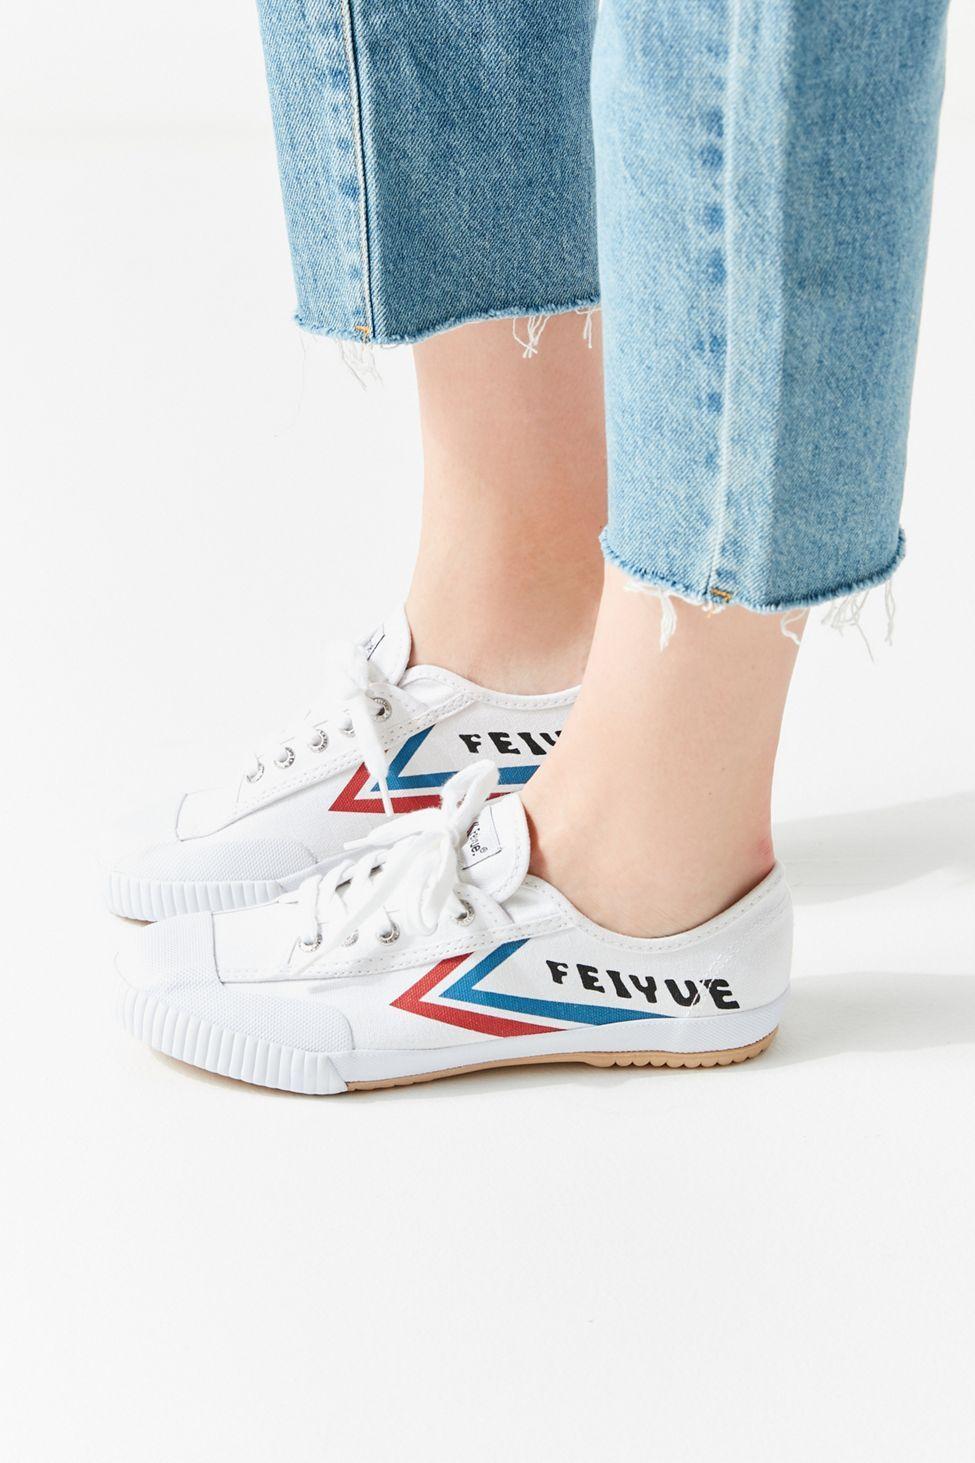 Feiyue Fe Lo Classic Sneaker | Classic